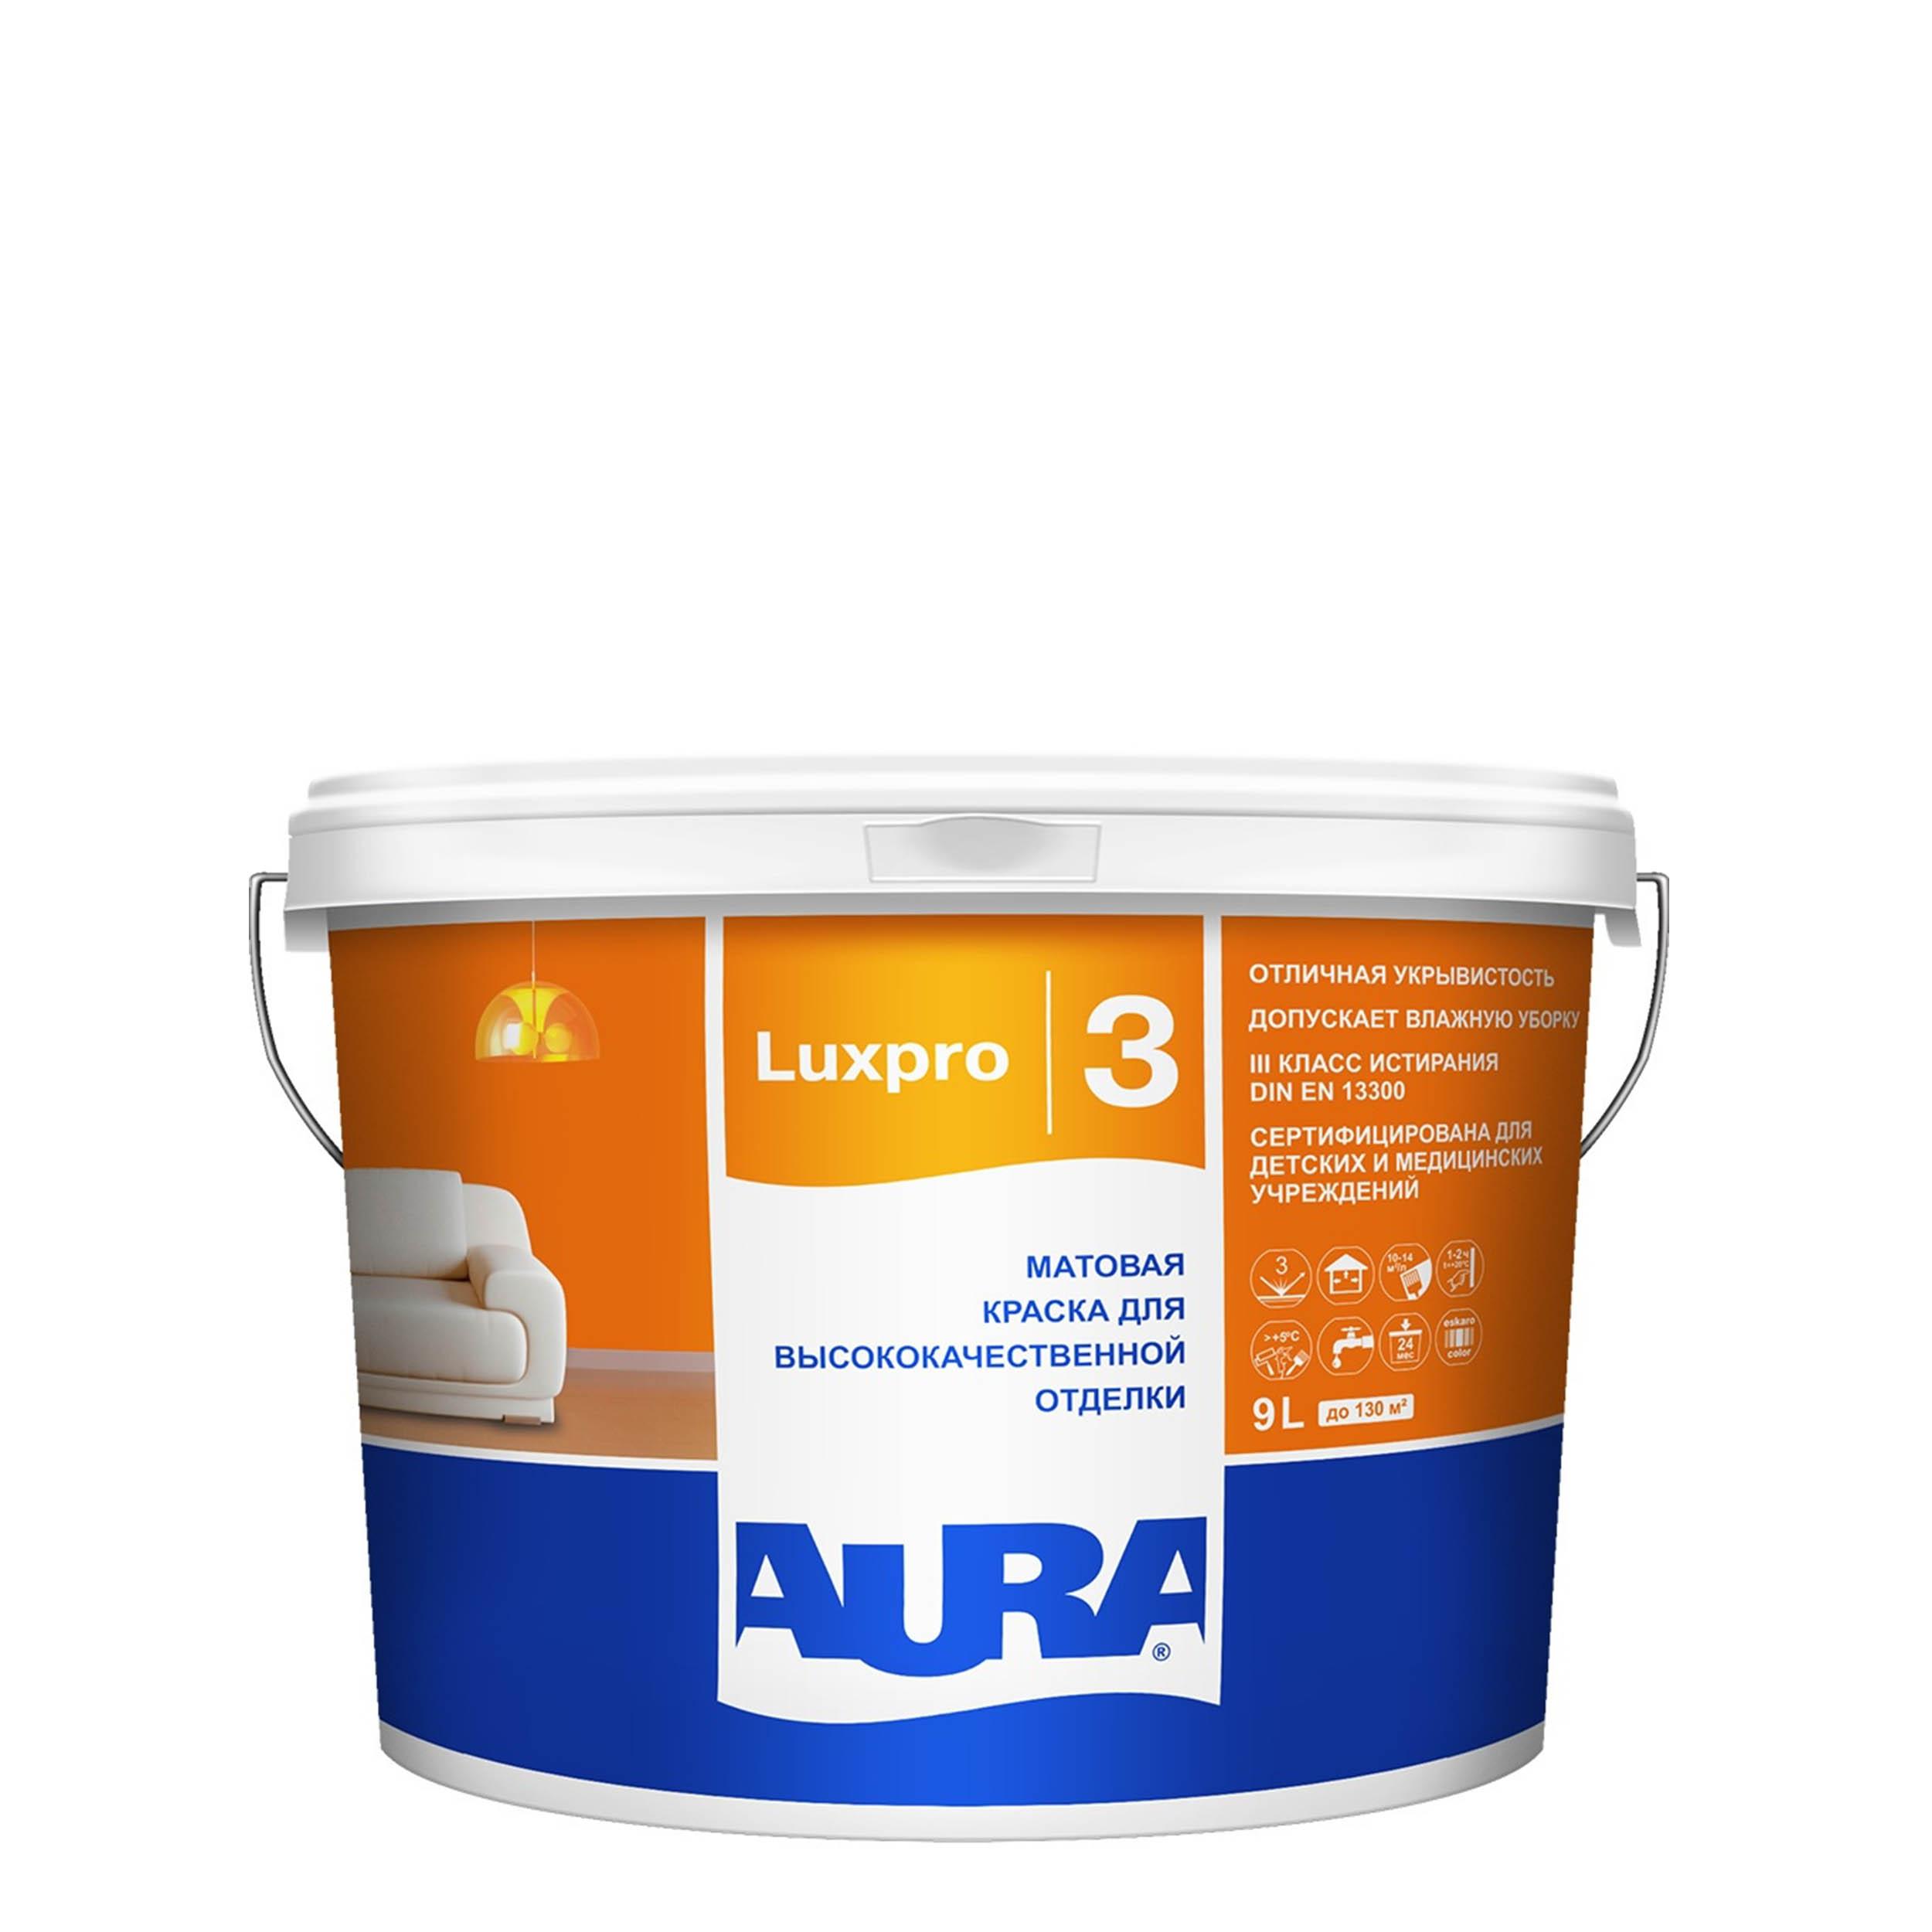 Фото 3 - Краска интерьерная, Aura LuxPRO 3, RAL 6022, 11 кг.